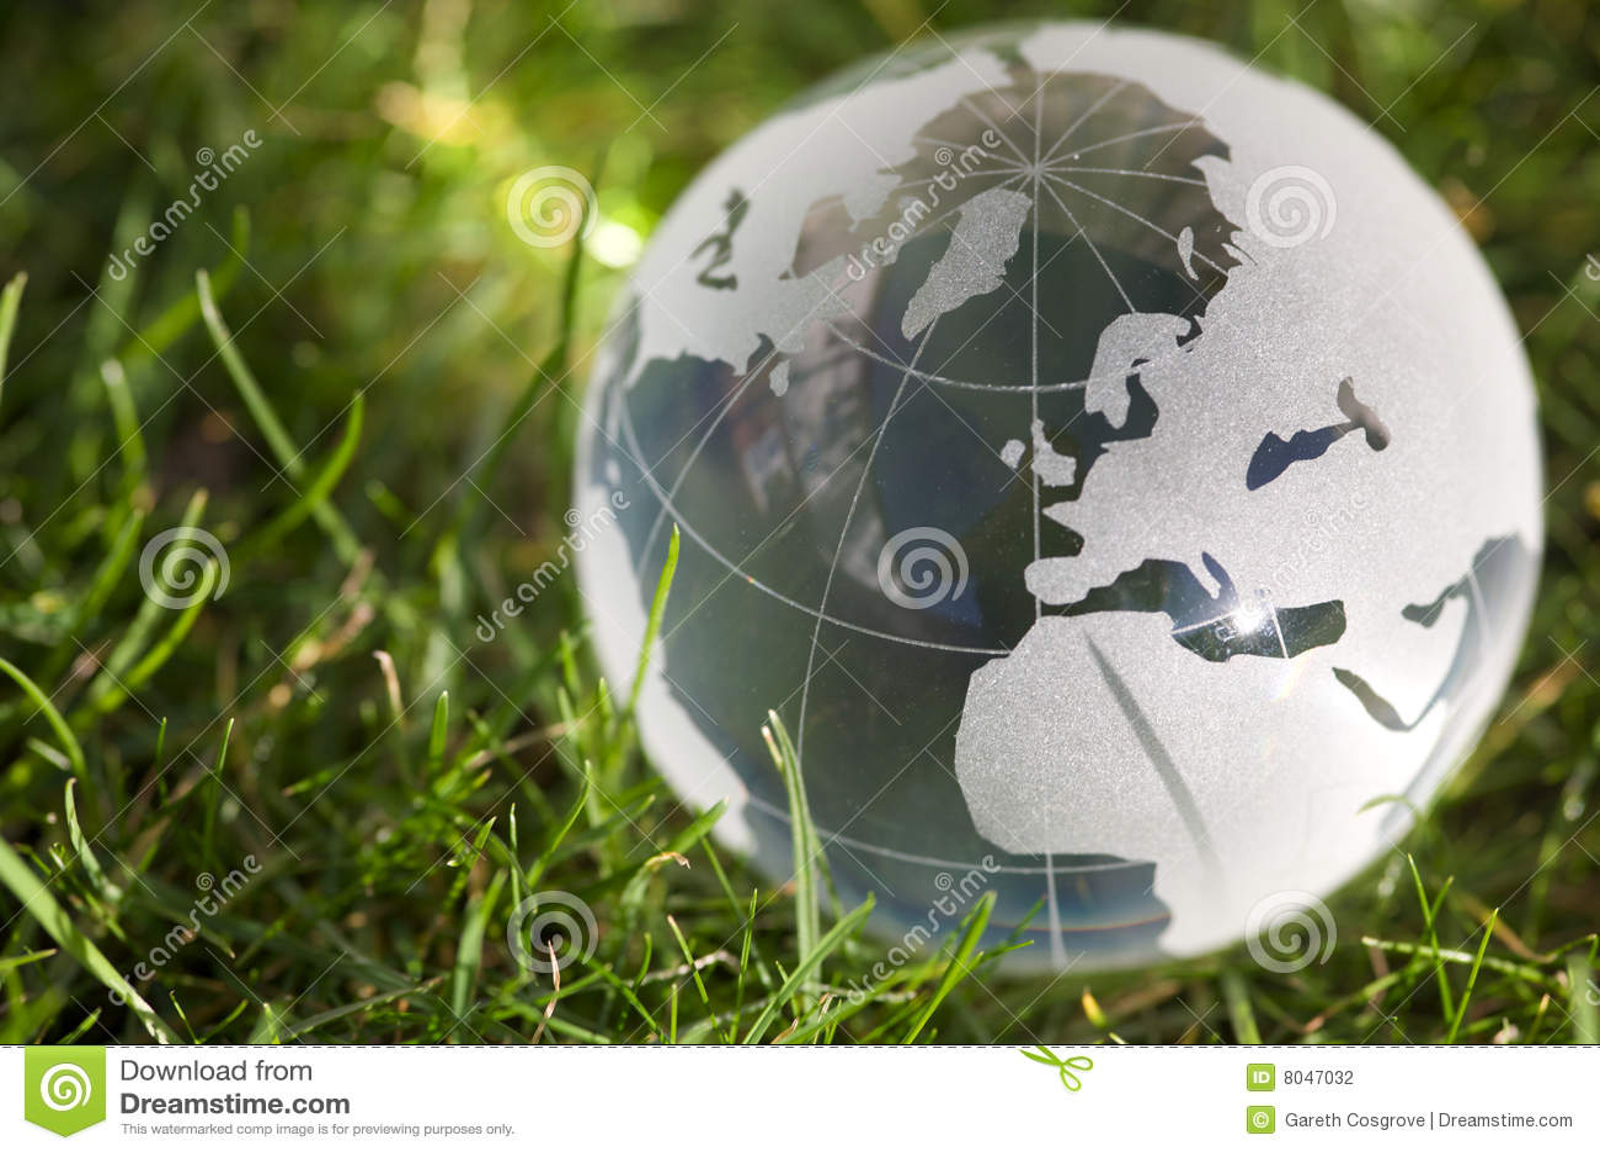 Globe in glass